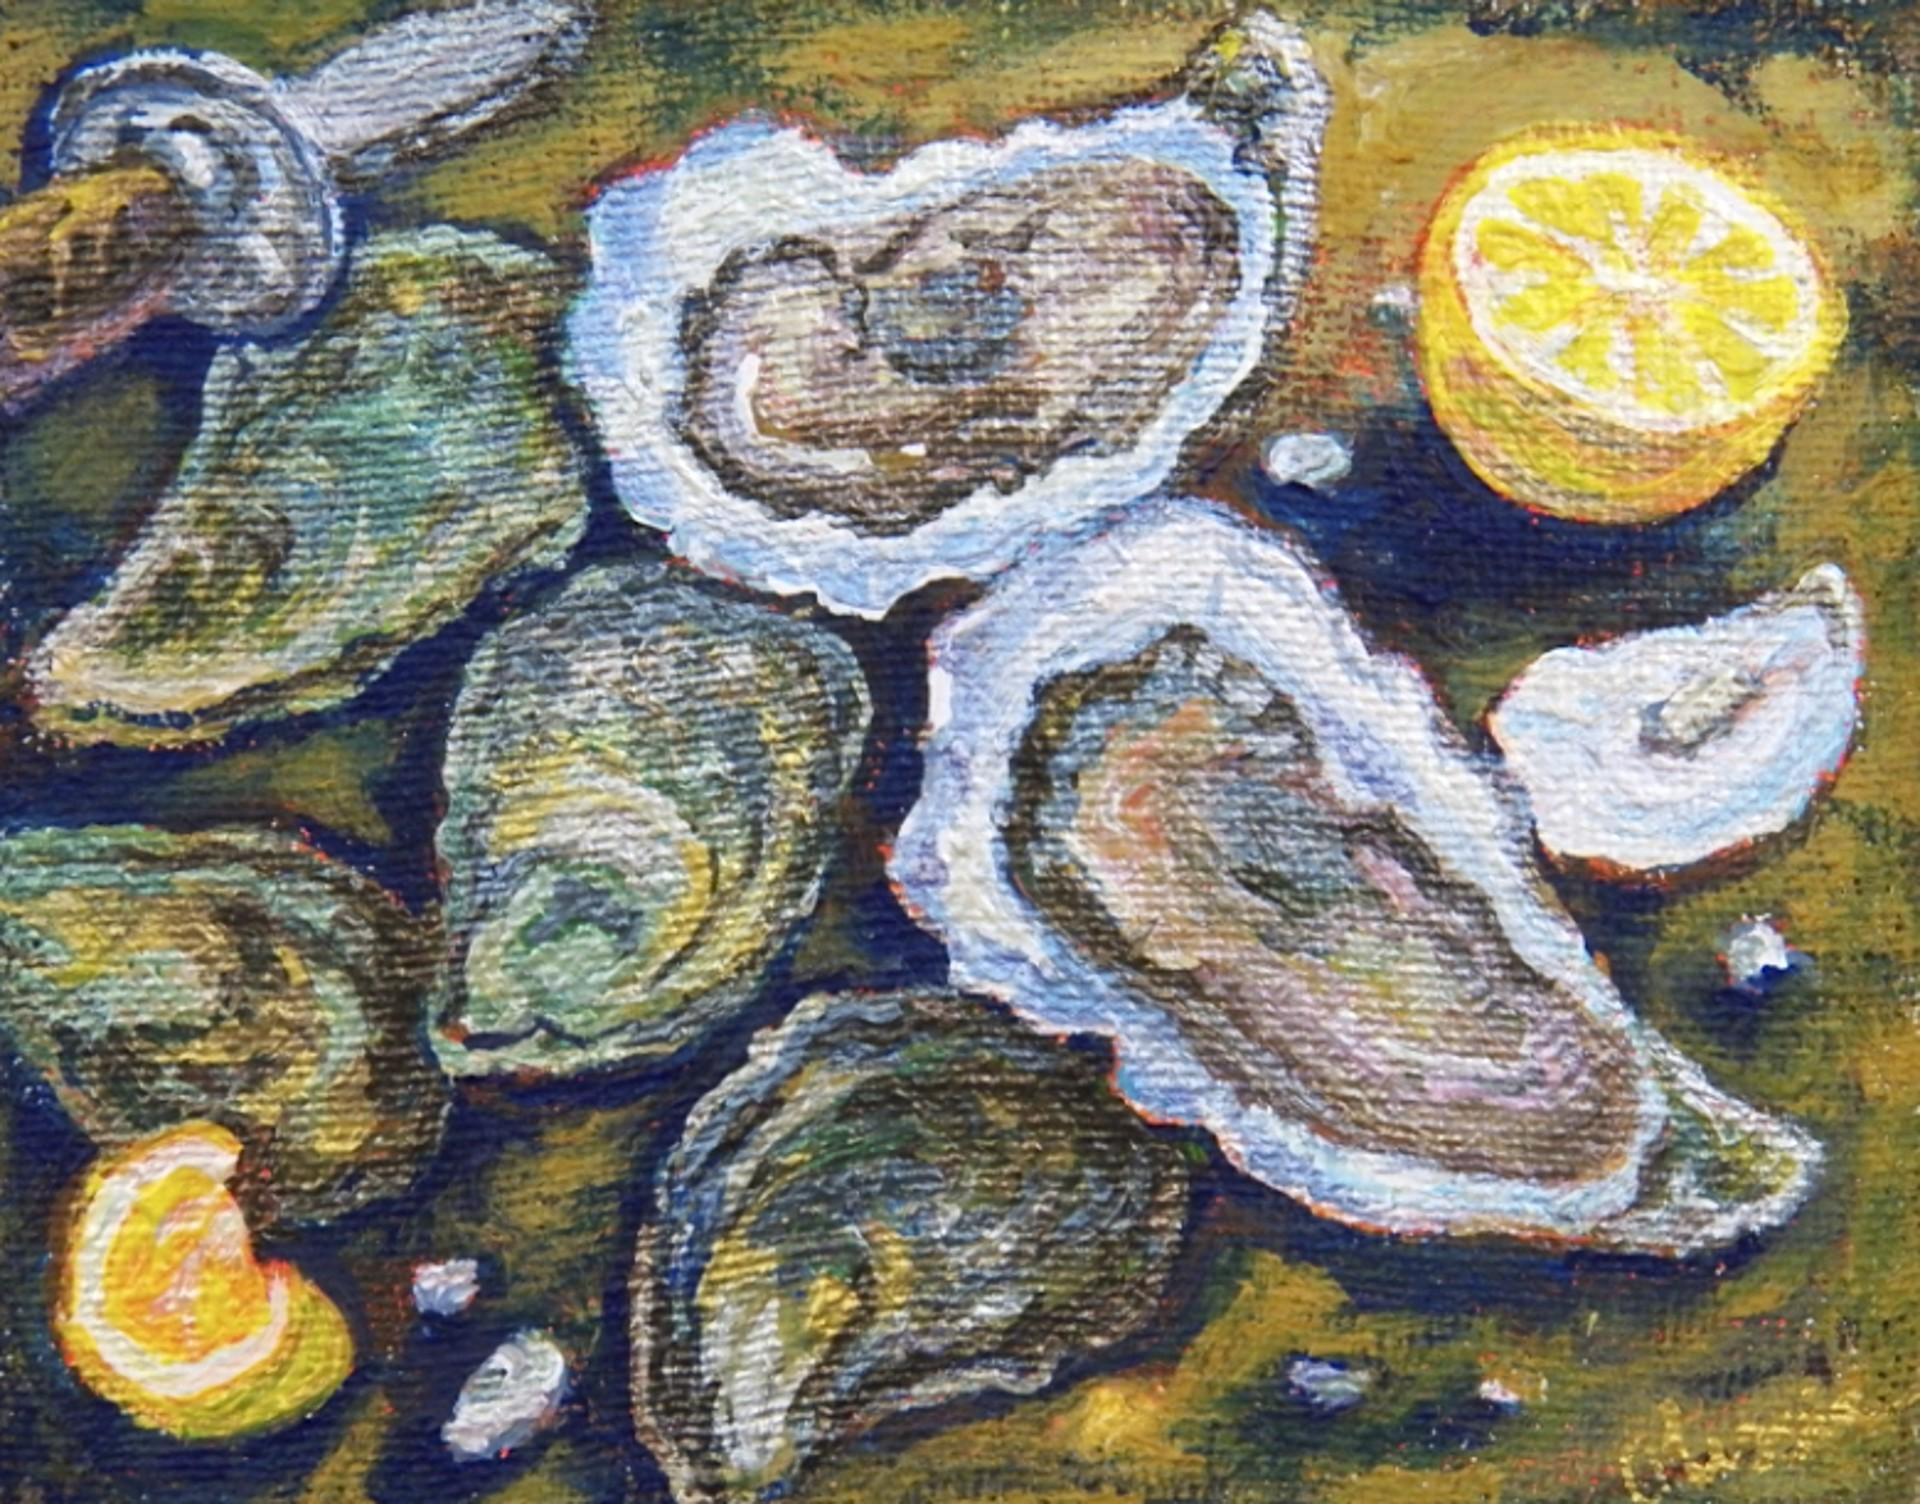 Still Life Oysters by Olessia Maximenko